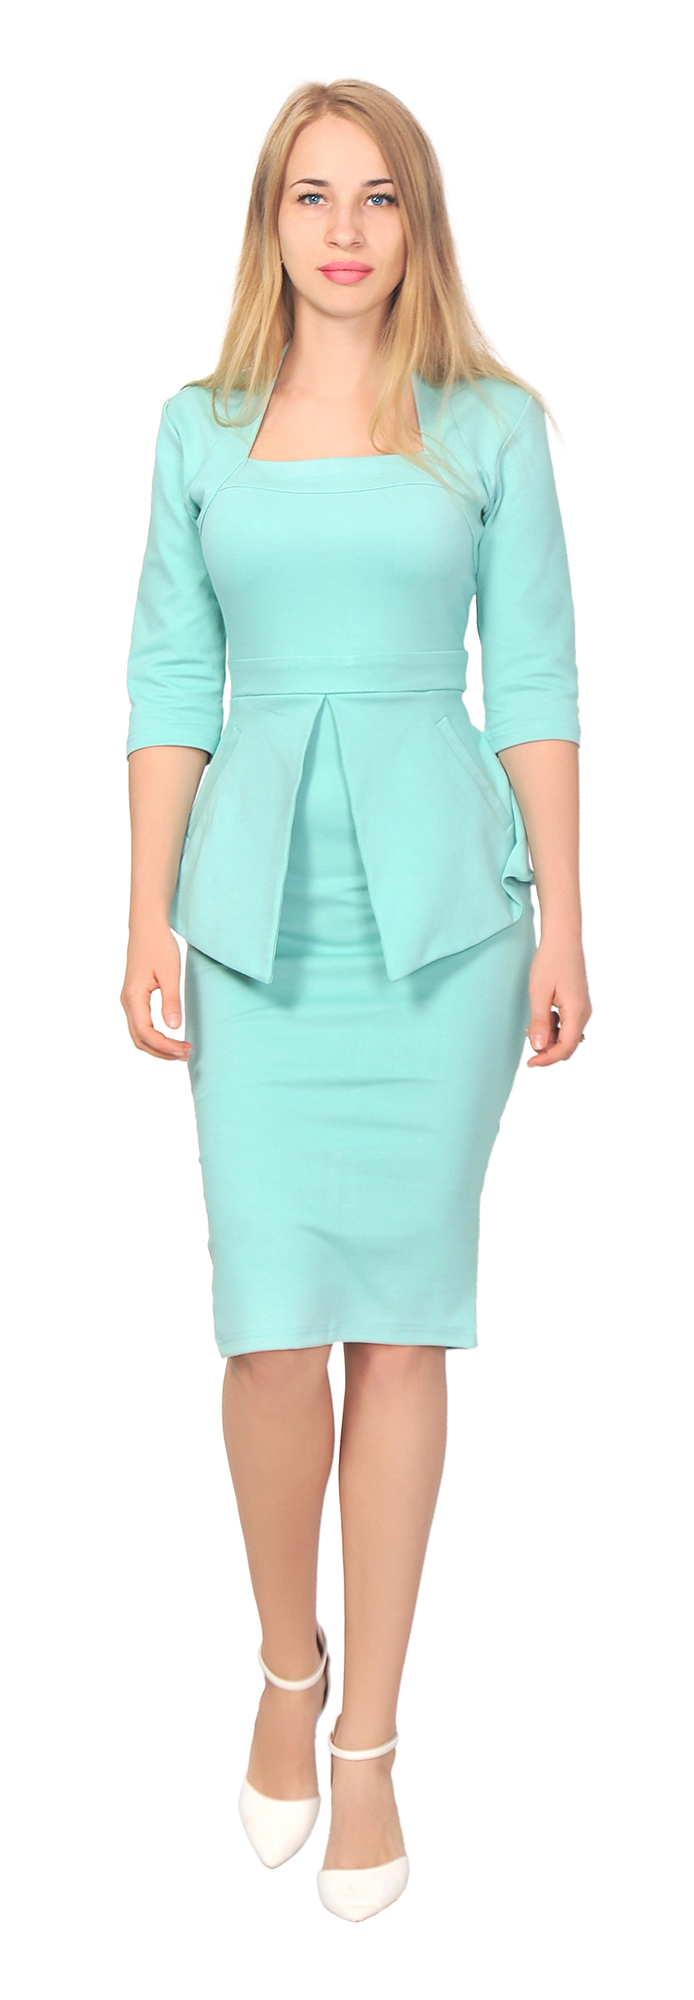 WOMEN\'S ELEGANT PEPLUM DRESS WORK OFFICE VINTAGE PENCIL 1950S RETRO ...